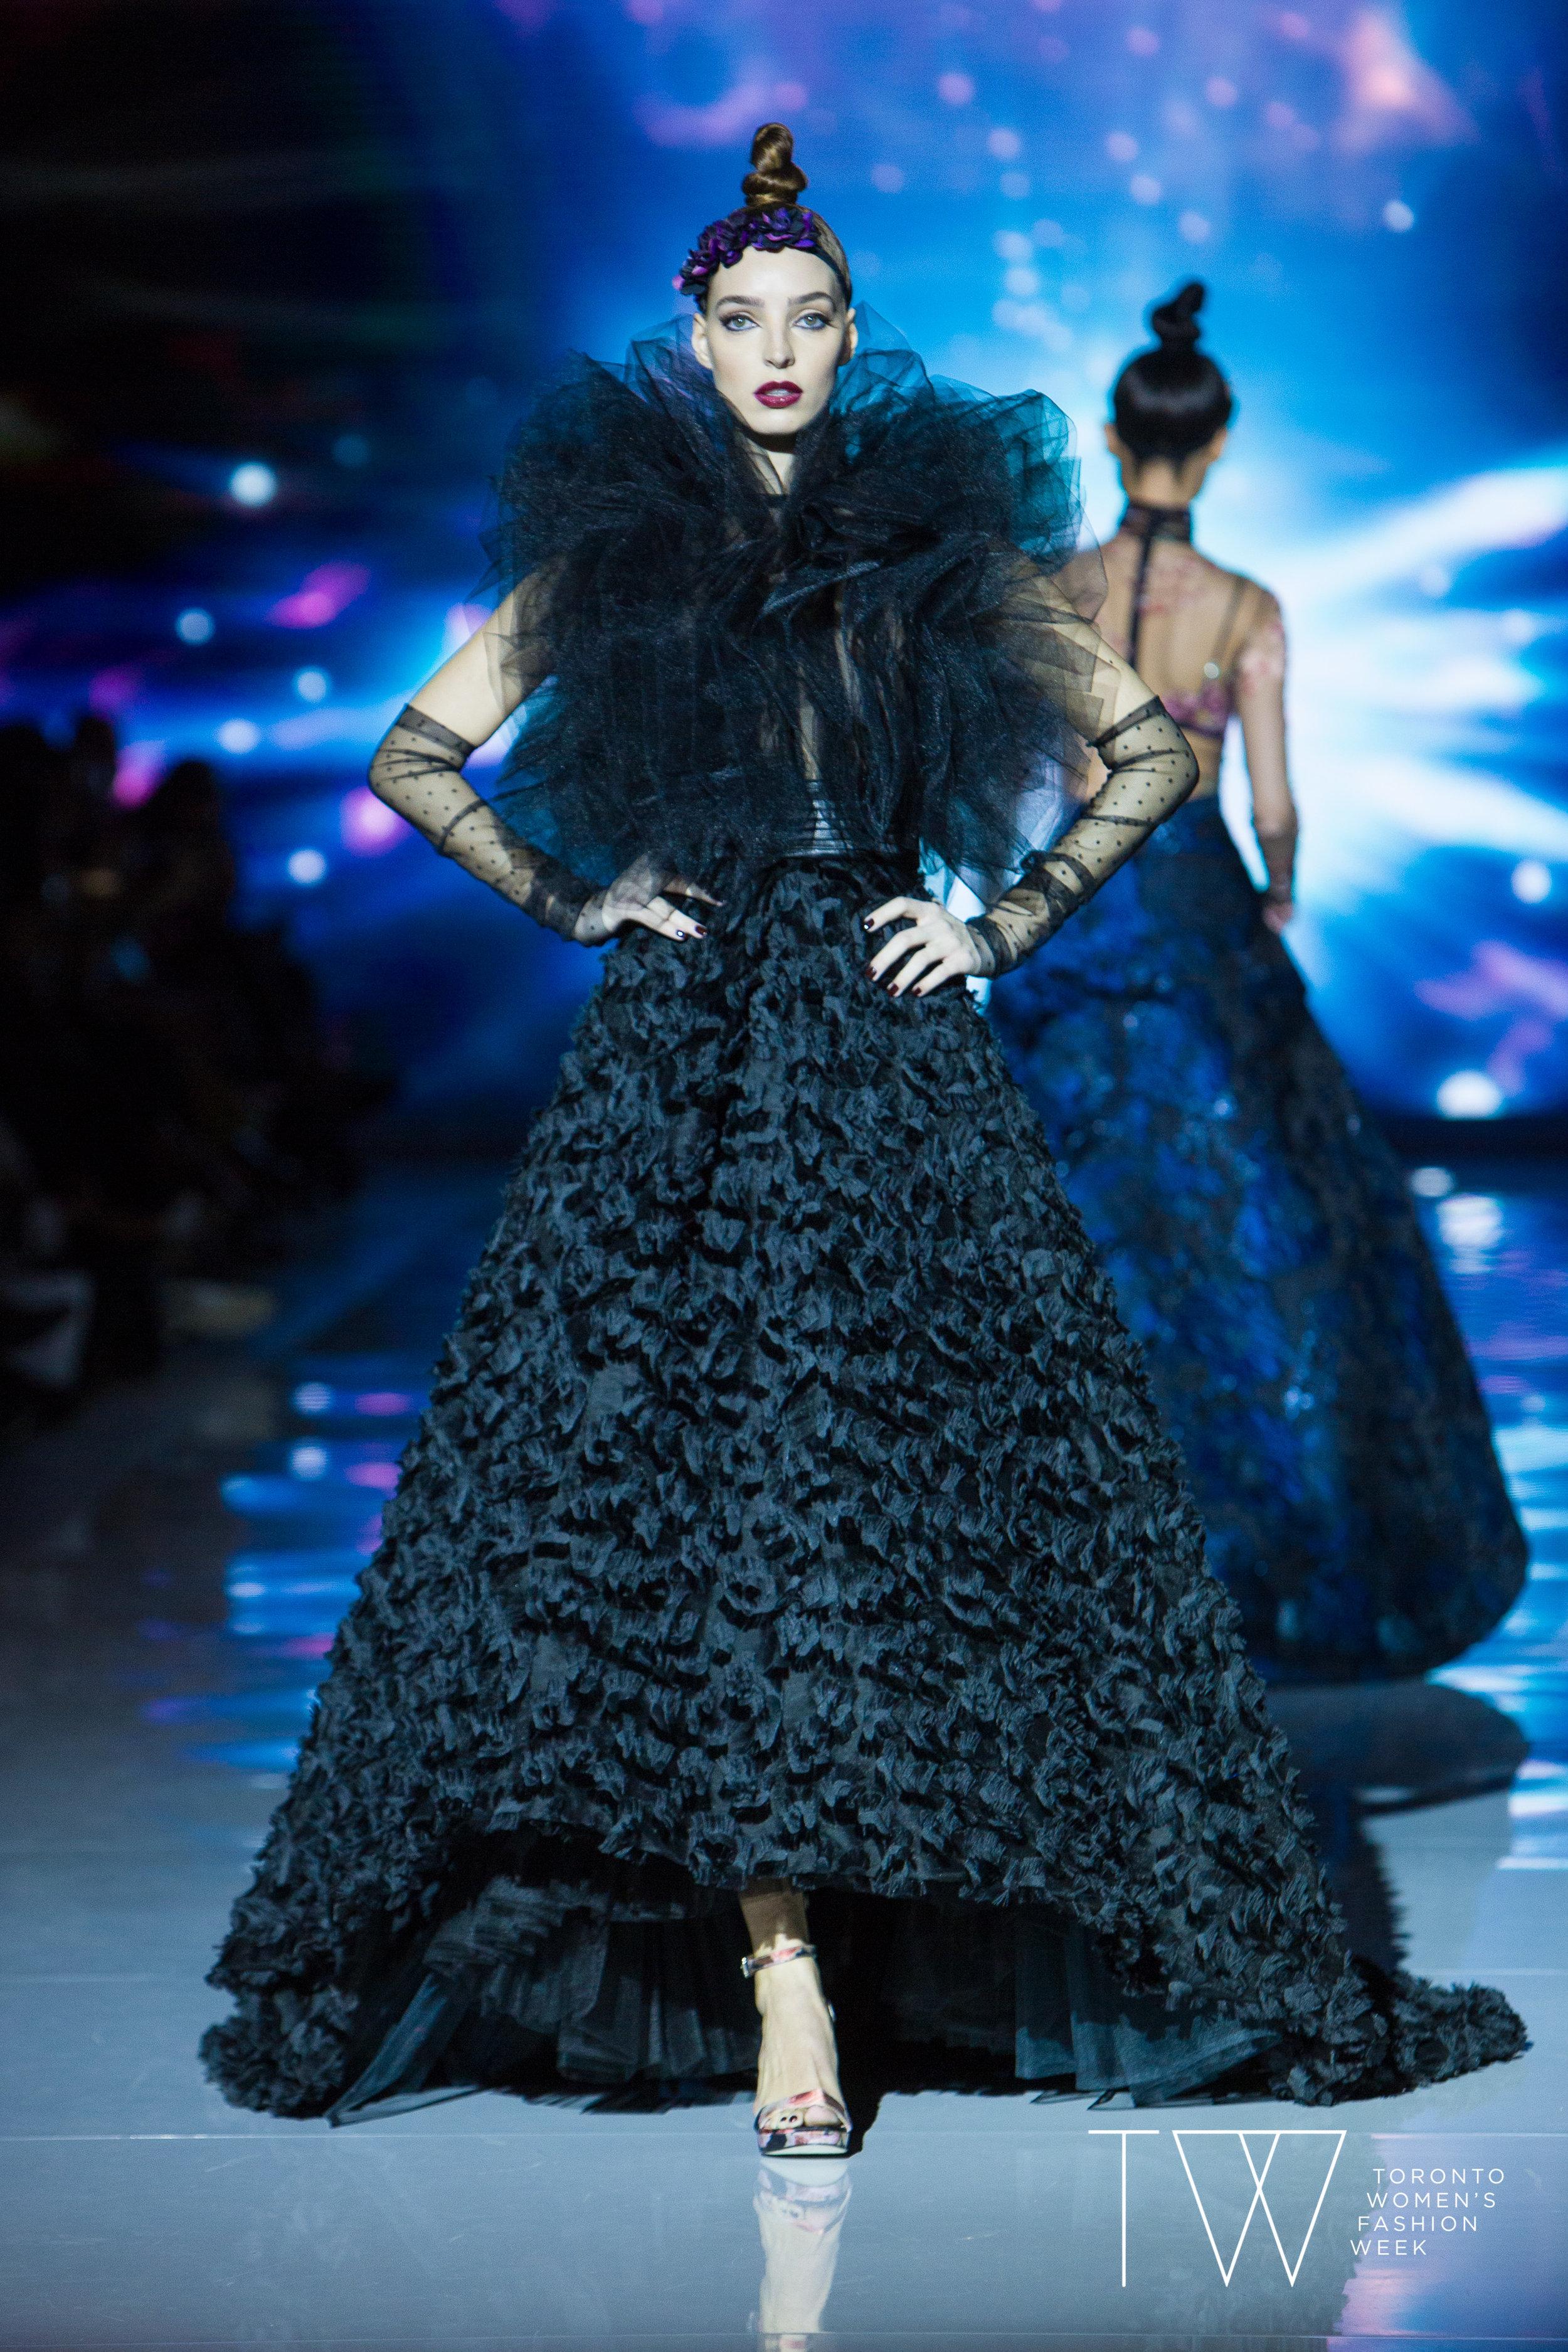 Stephan Caras image courtesy of Toronto Women's Fashion Week